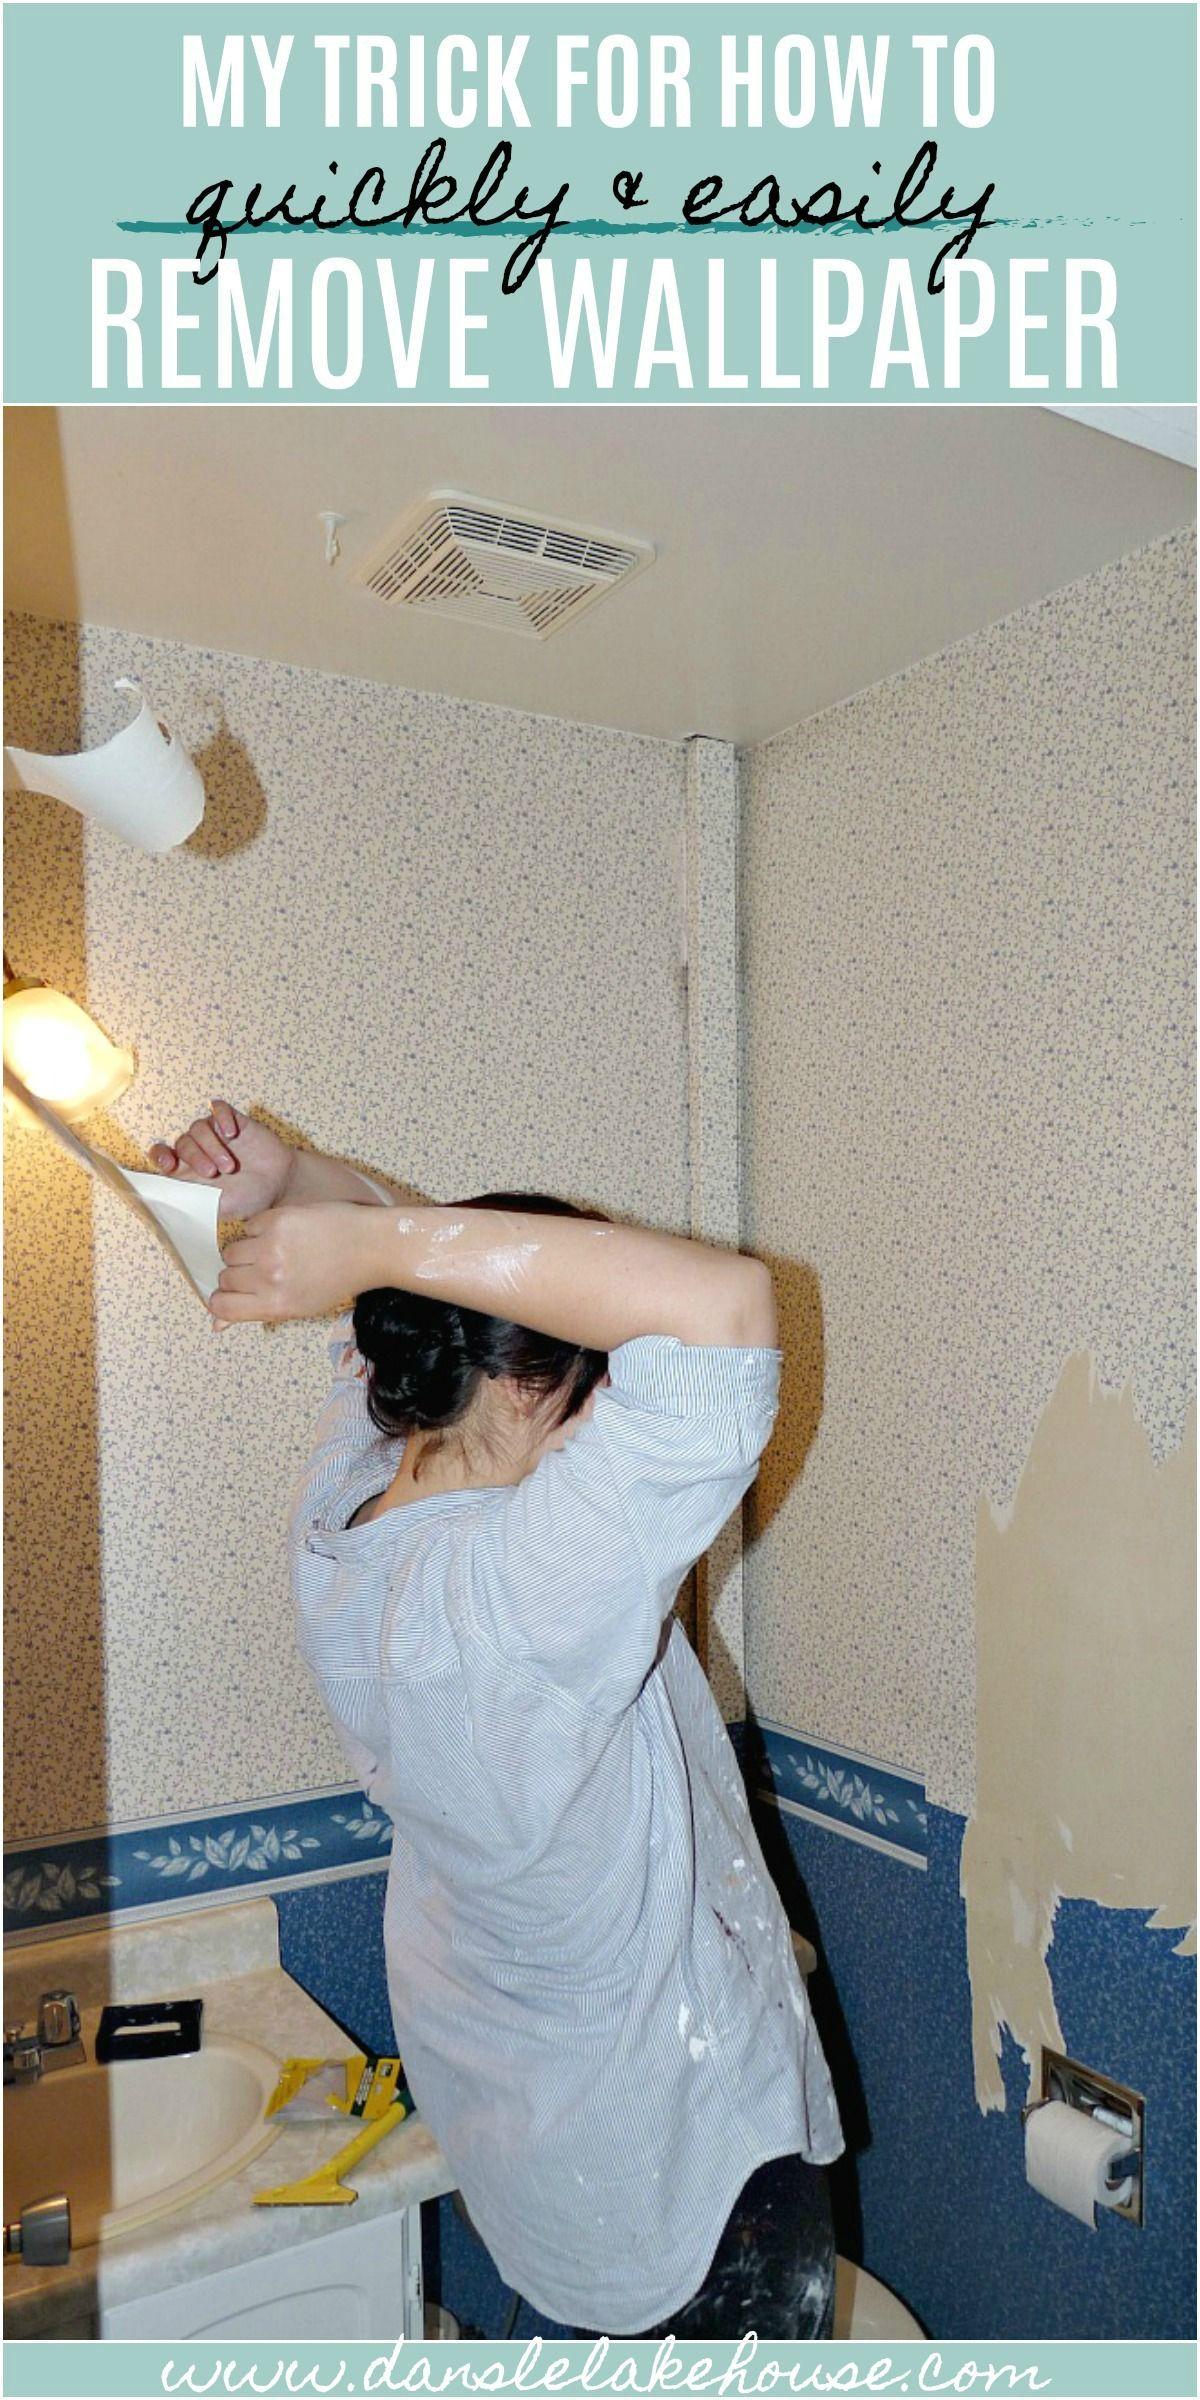 How To Easily Remove Wallpaper Dans Le Lakehouse Removable Wallpaper Easy Diy Decor Diy Renovation